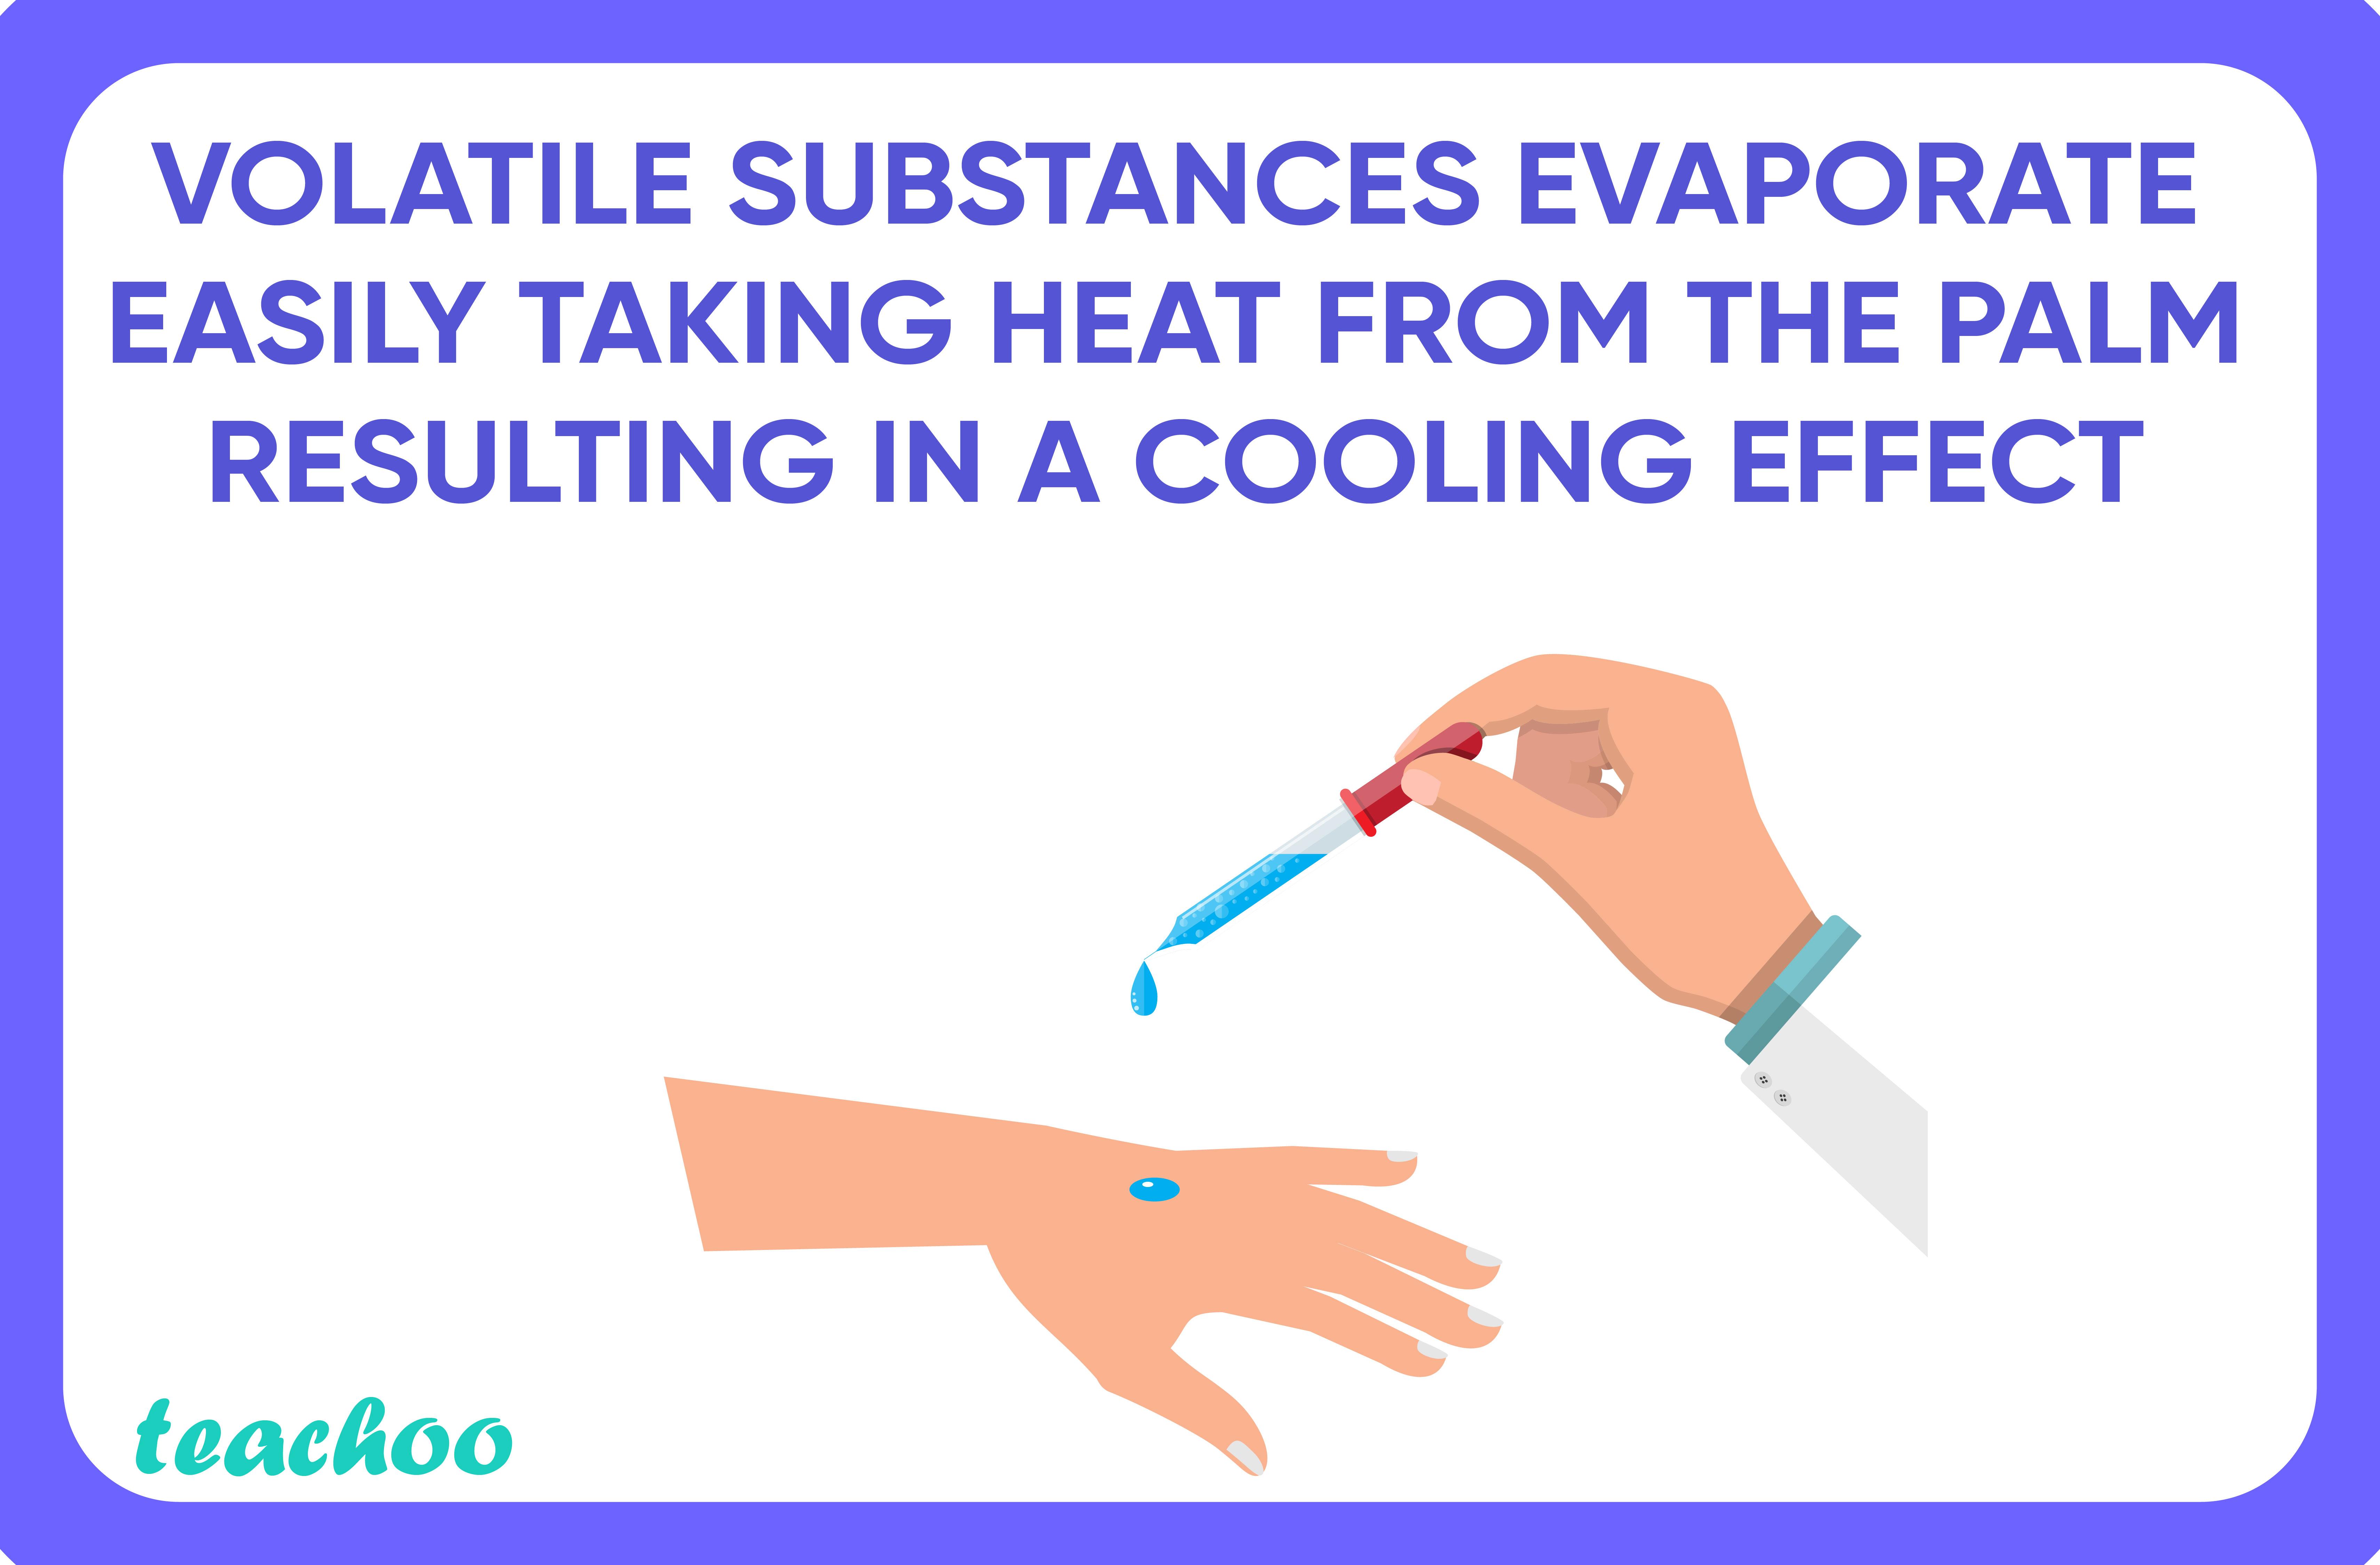 Volatile substances evaporate easily taking-Teachoo-01.jpg